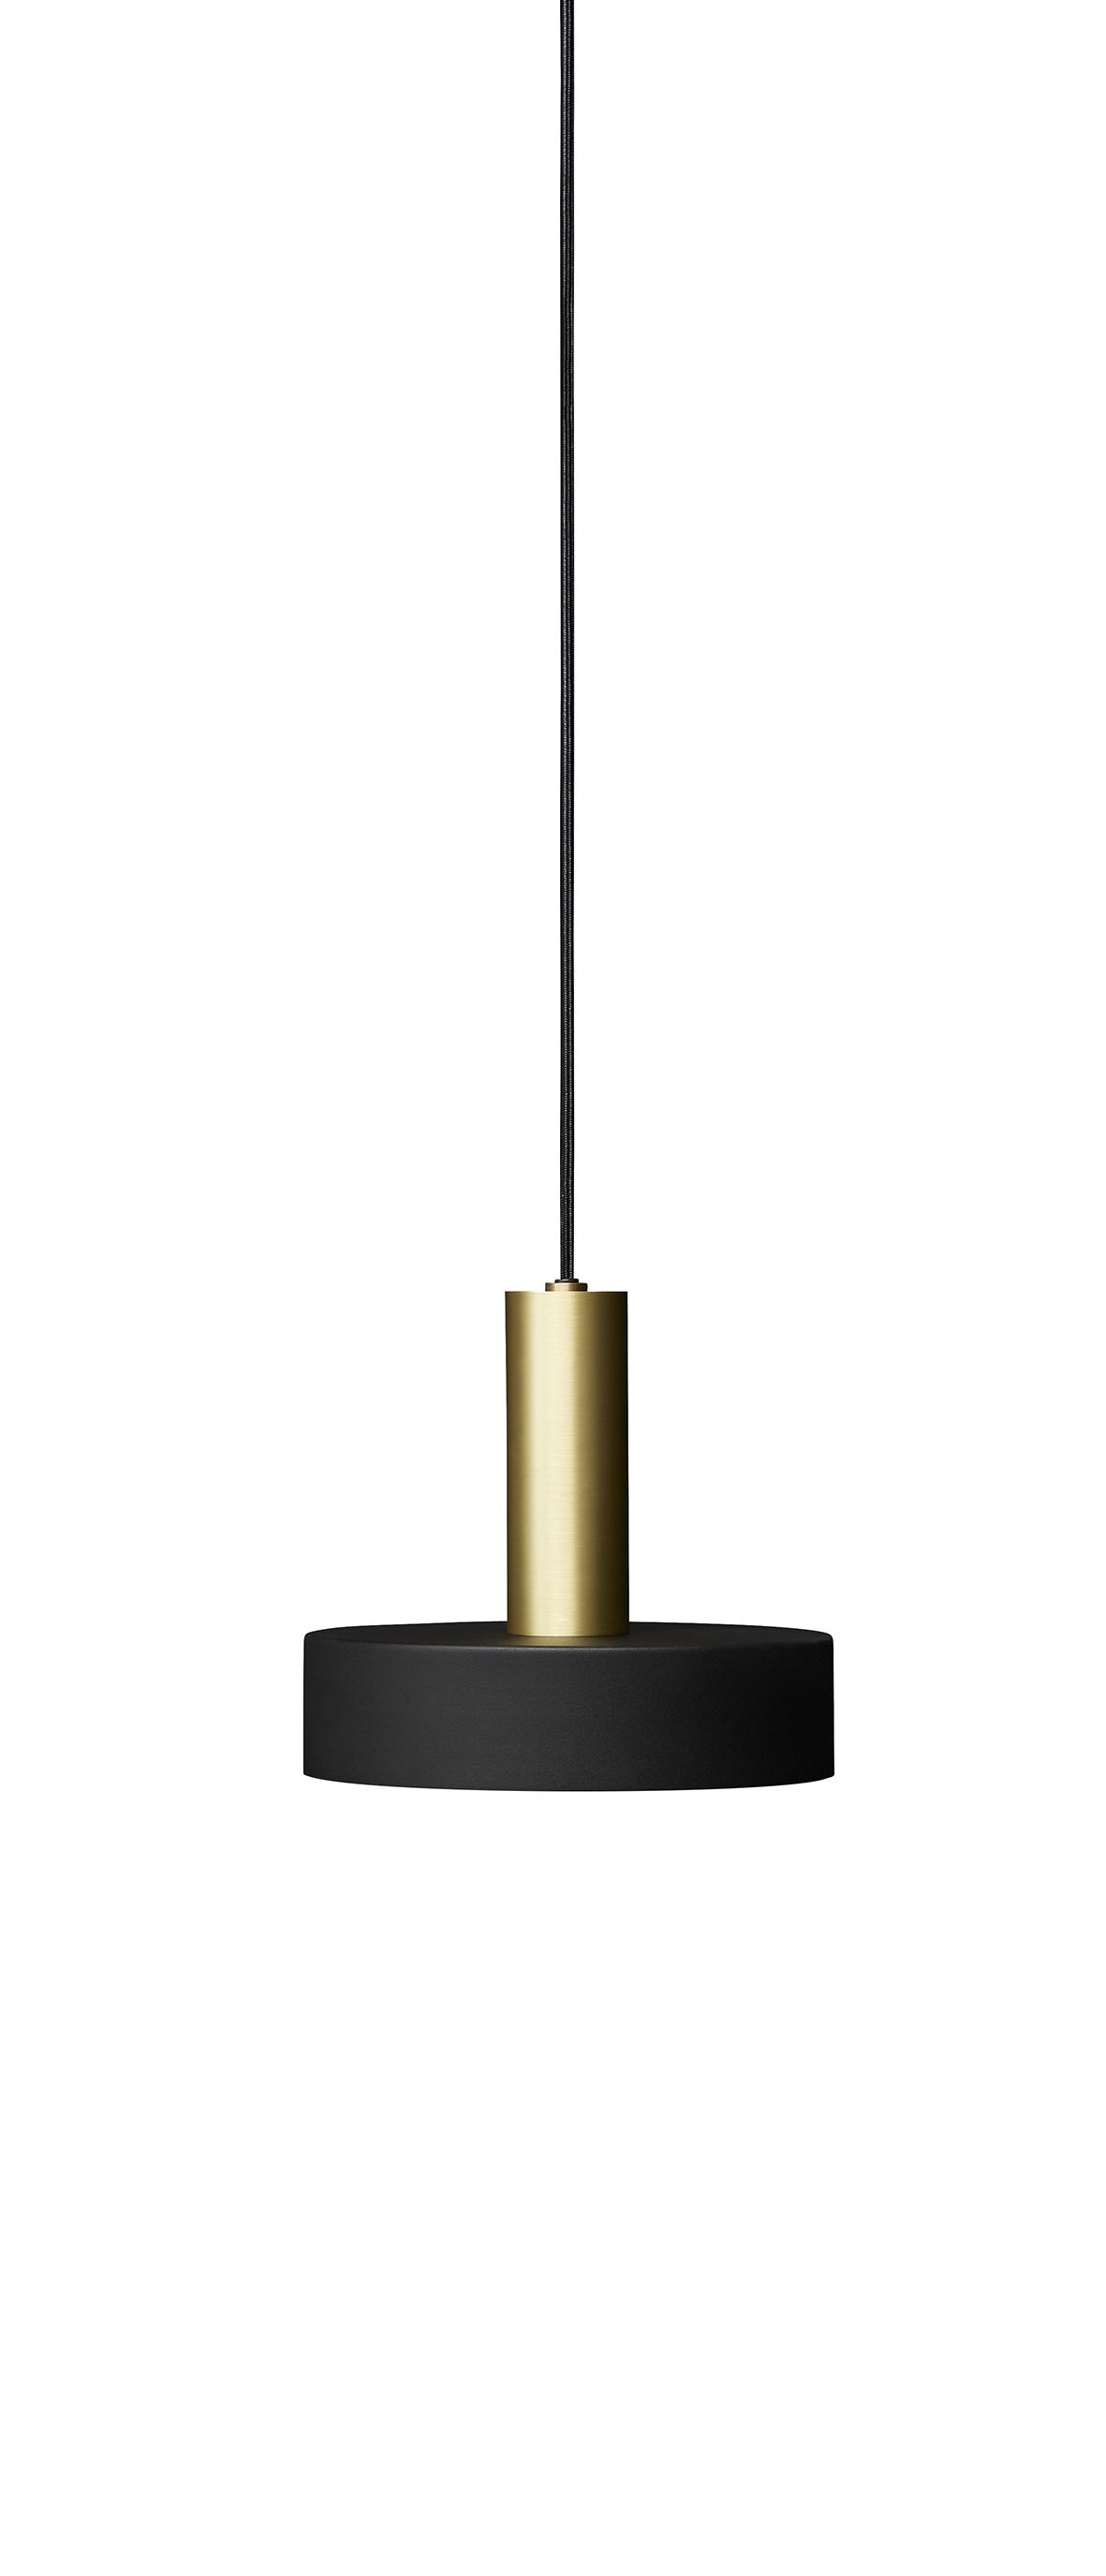 Lustra SL01 O25 cm H225 cm Black / Brass